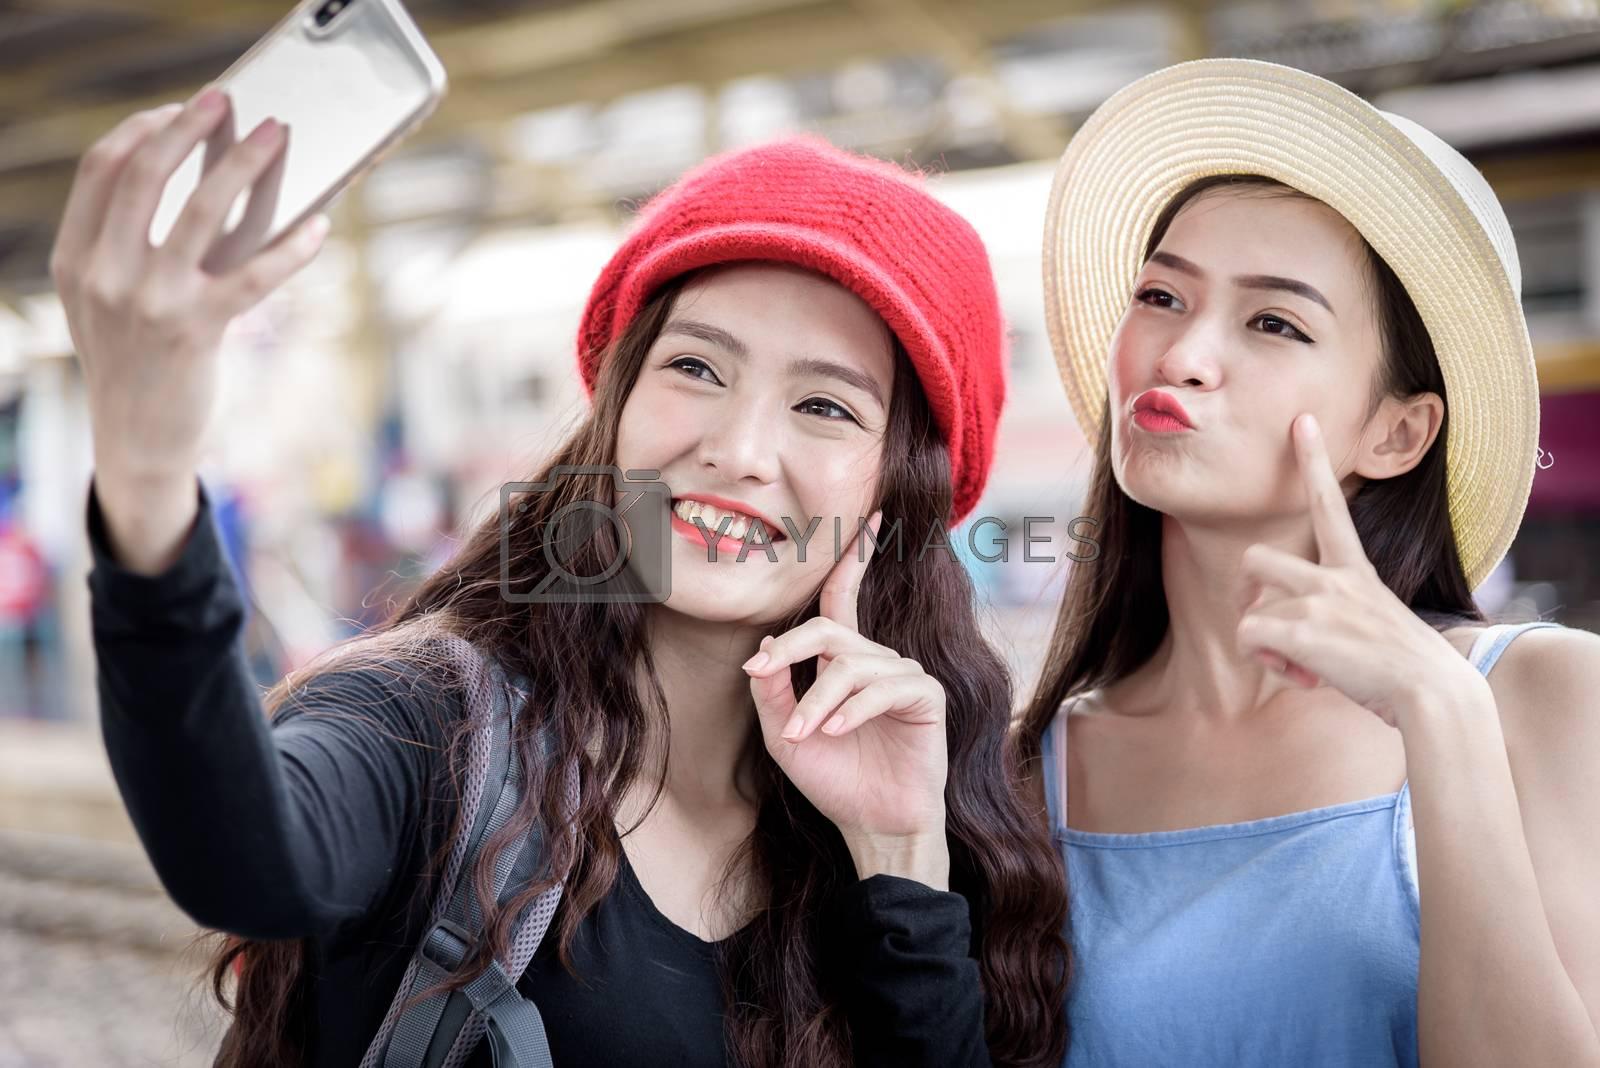 Asian women traveler have playing a mobile phone and talking for waiting the train with happiness at Hua Lamphong station at Bangkok, Thailand.